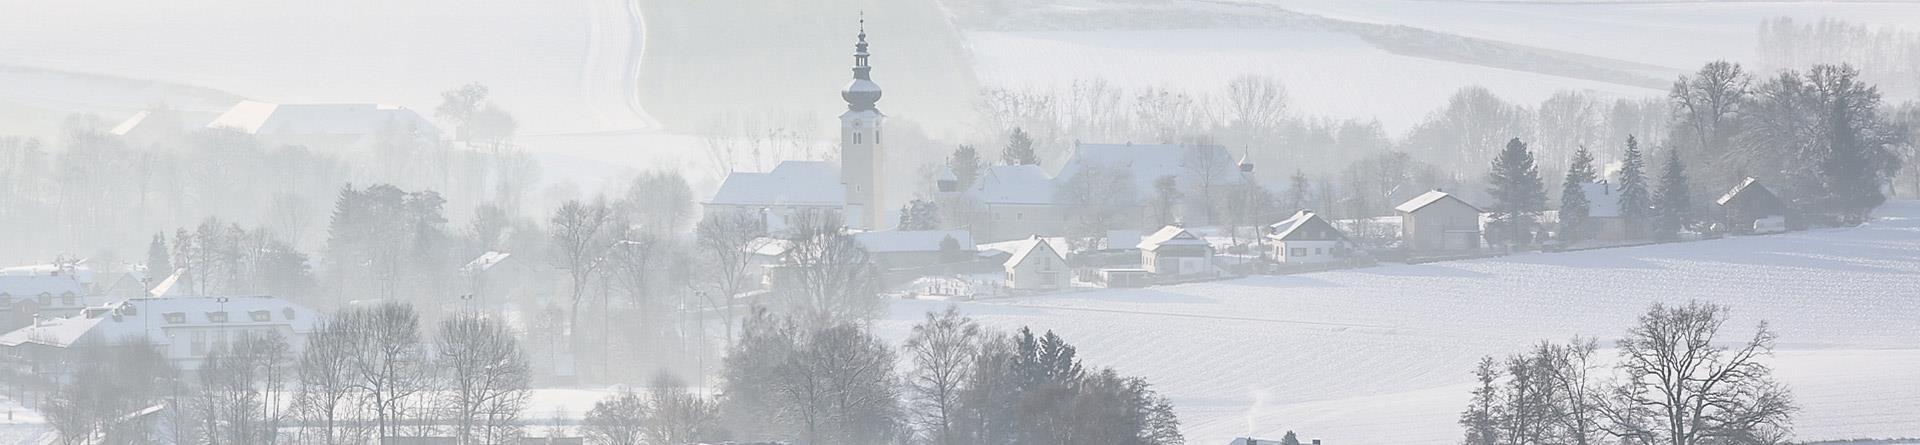 Gem2Go - Buchkirchen - RiS-Kommunal